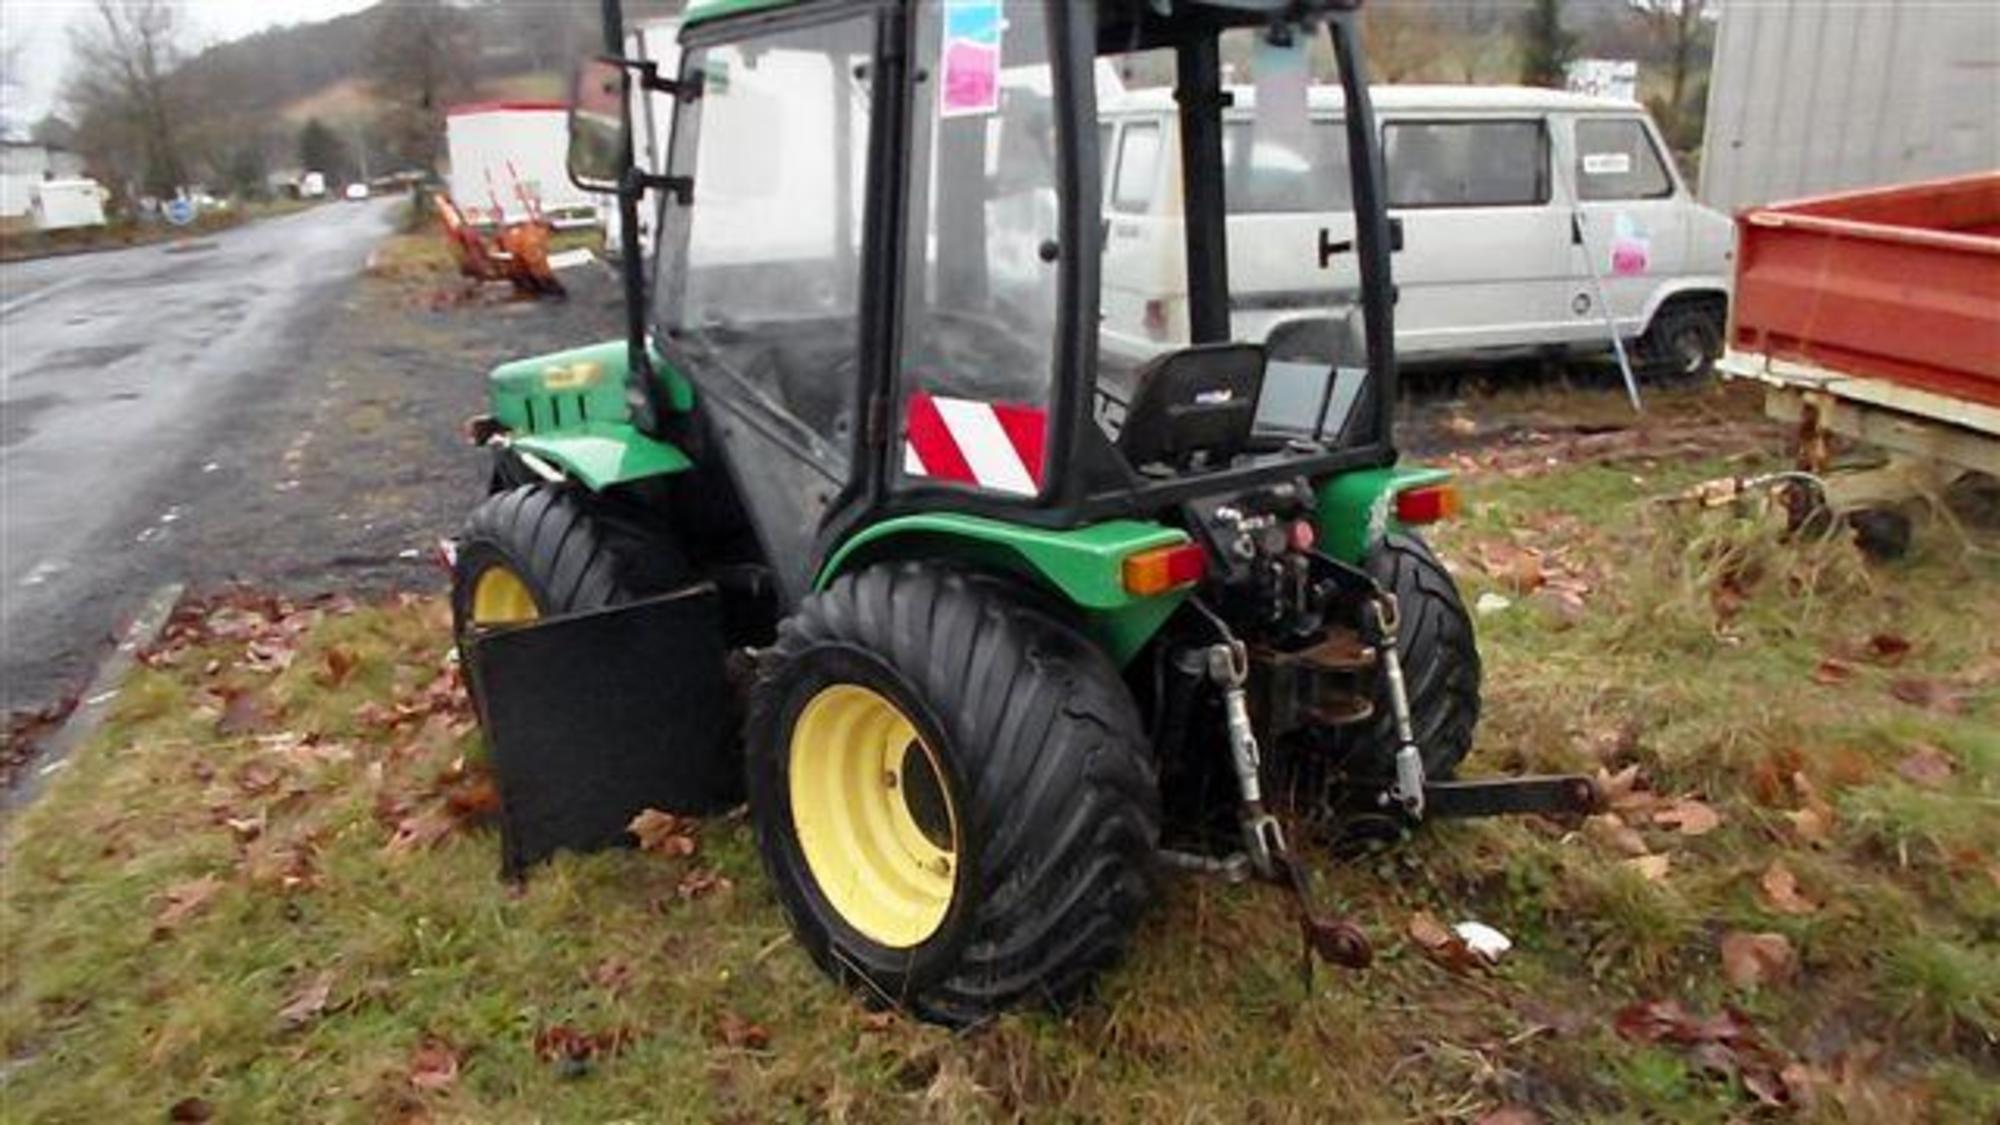 ferrari 76 tractor id es d 39 image de voiture. Black Bedroom Furniture Sets. Home Design Ideas